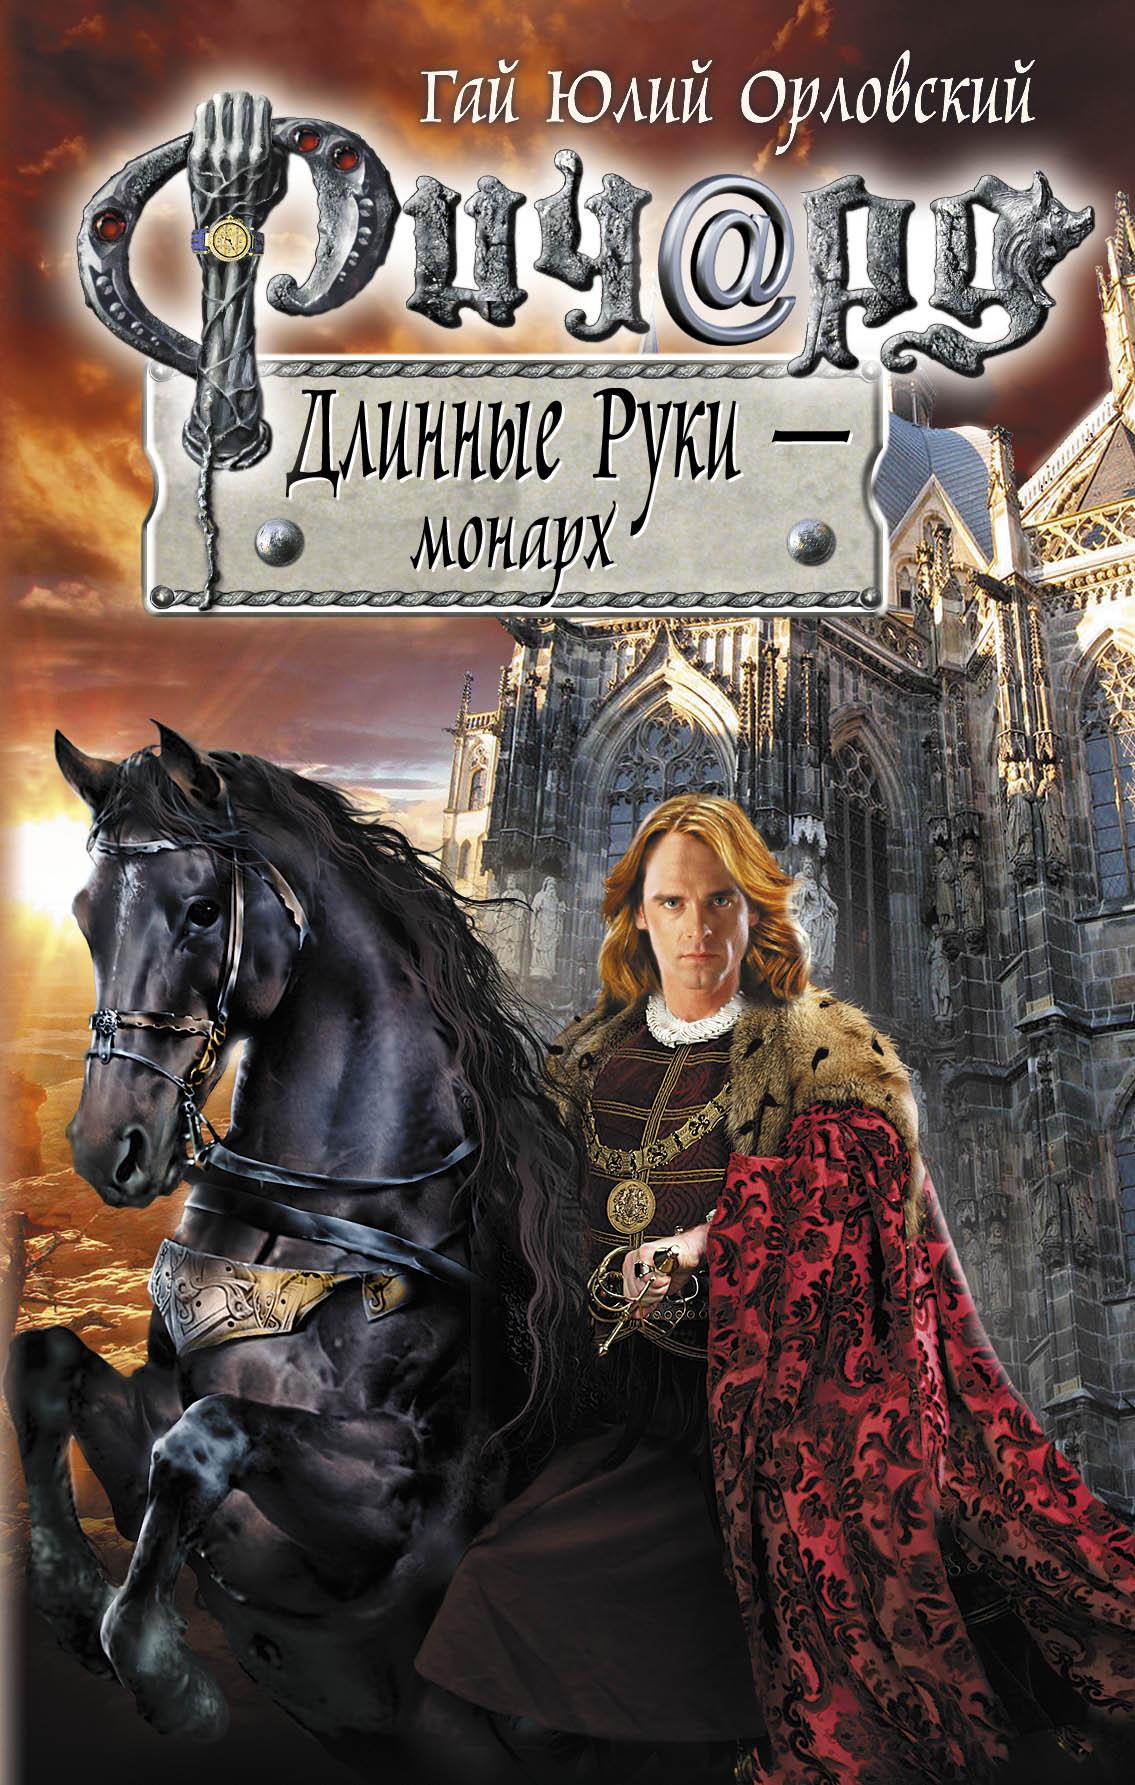 Ричард Длинные Руки - монарх